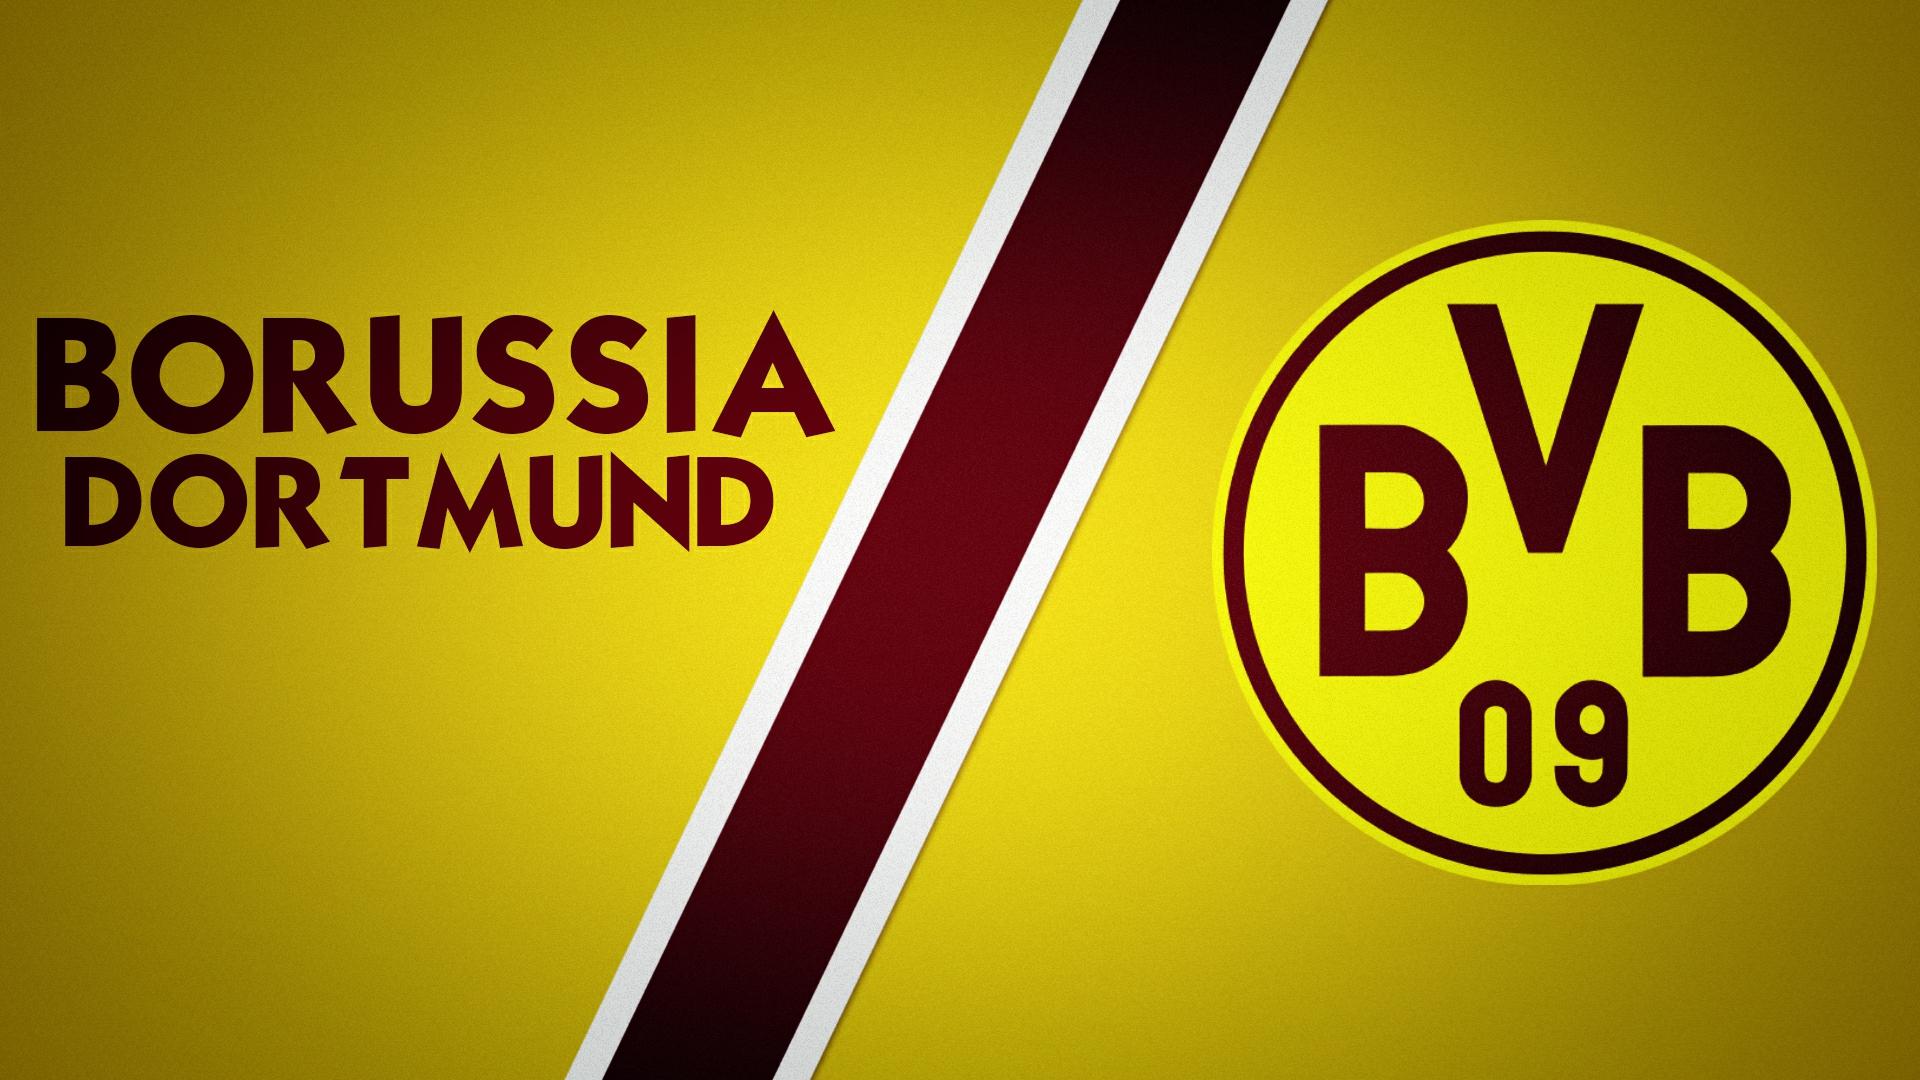 Borussia Dortmund Hd Wallpaper Background Image 1920x1080 Id 1024984 Wallpaper Abyss